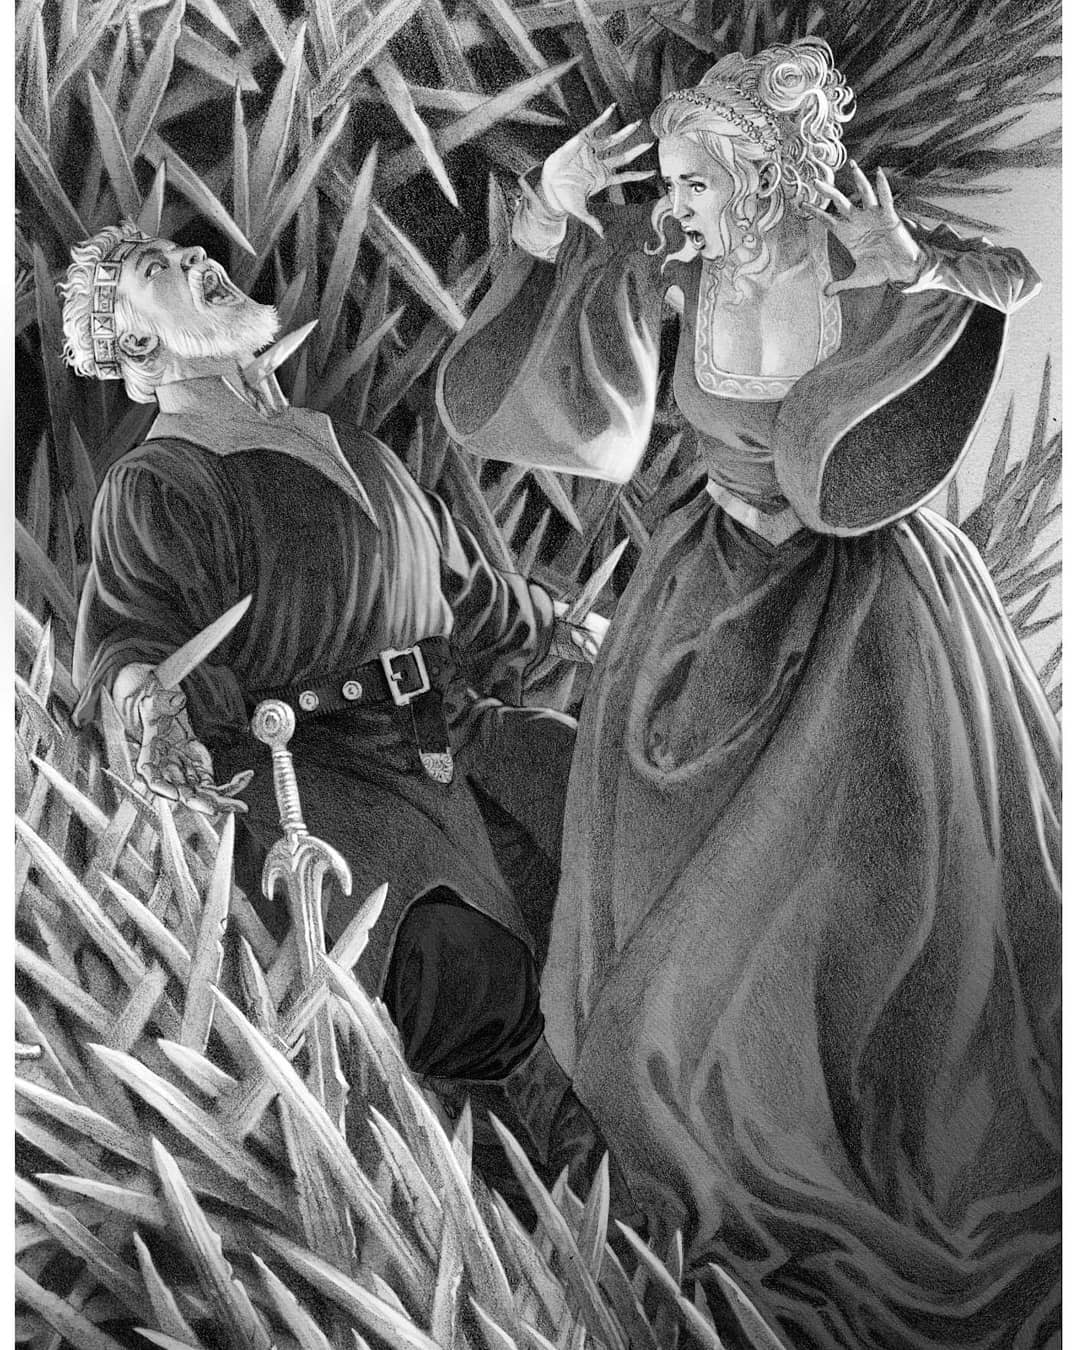 Resultado de imagen para fire and blood george rr martin illustrations